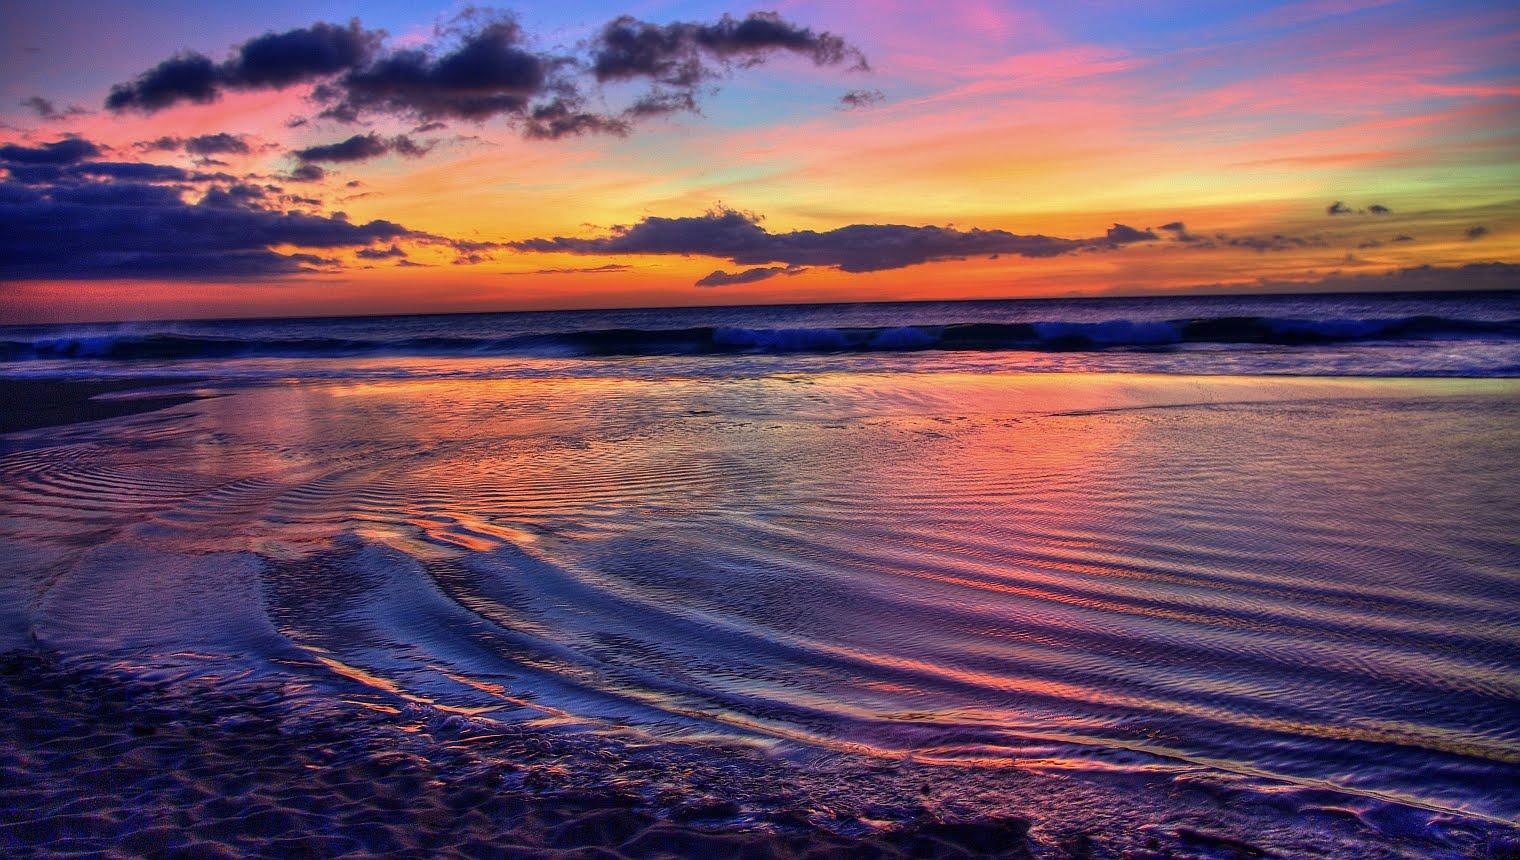 Daniel Herr: Hawaiian Sunset Wallpaper